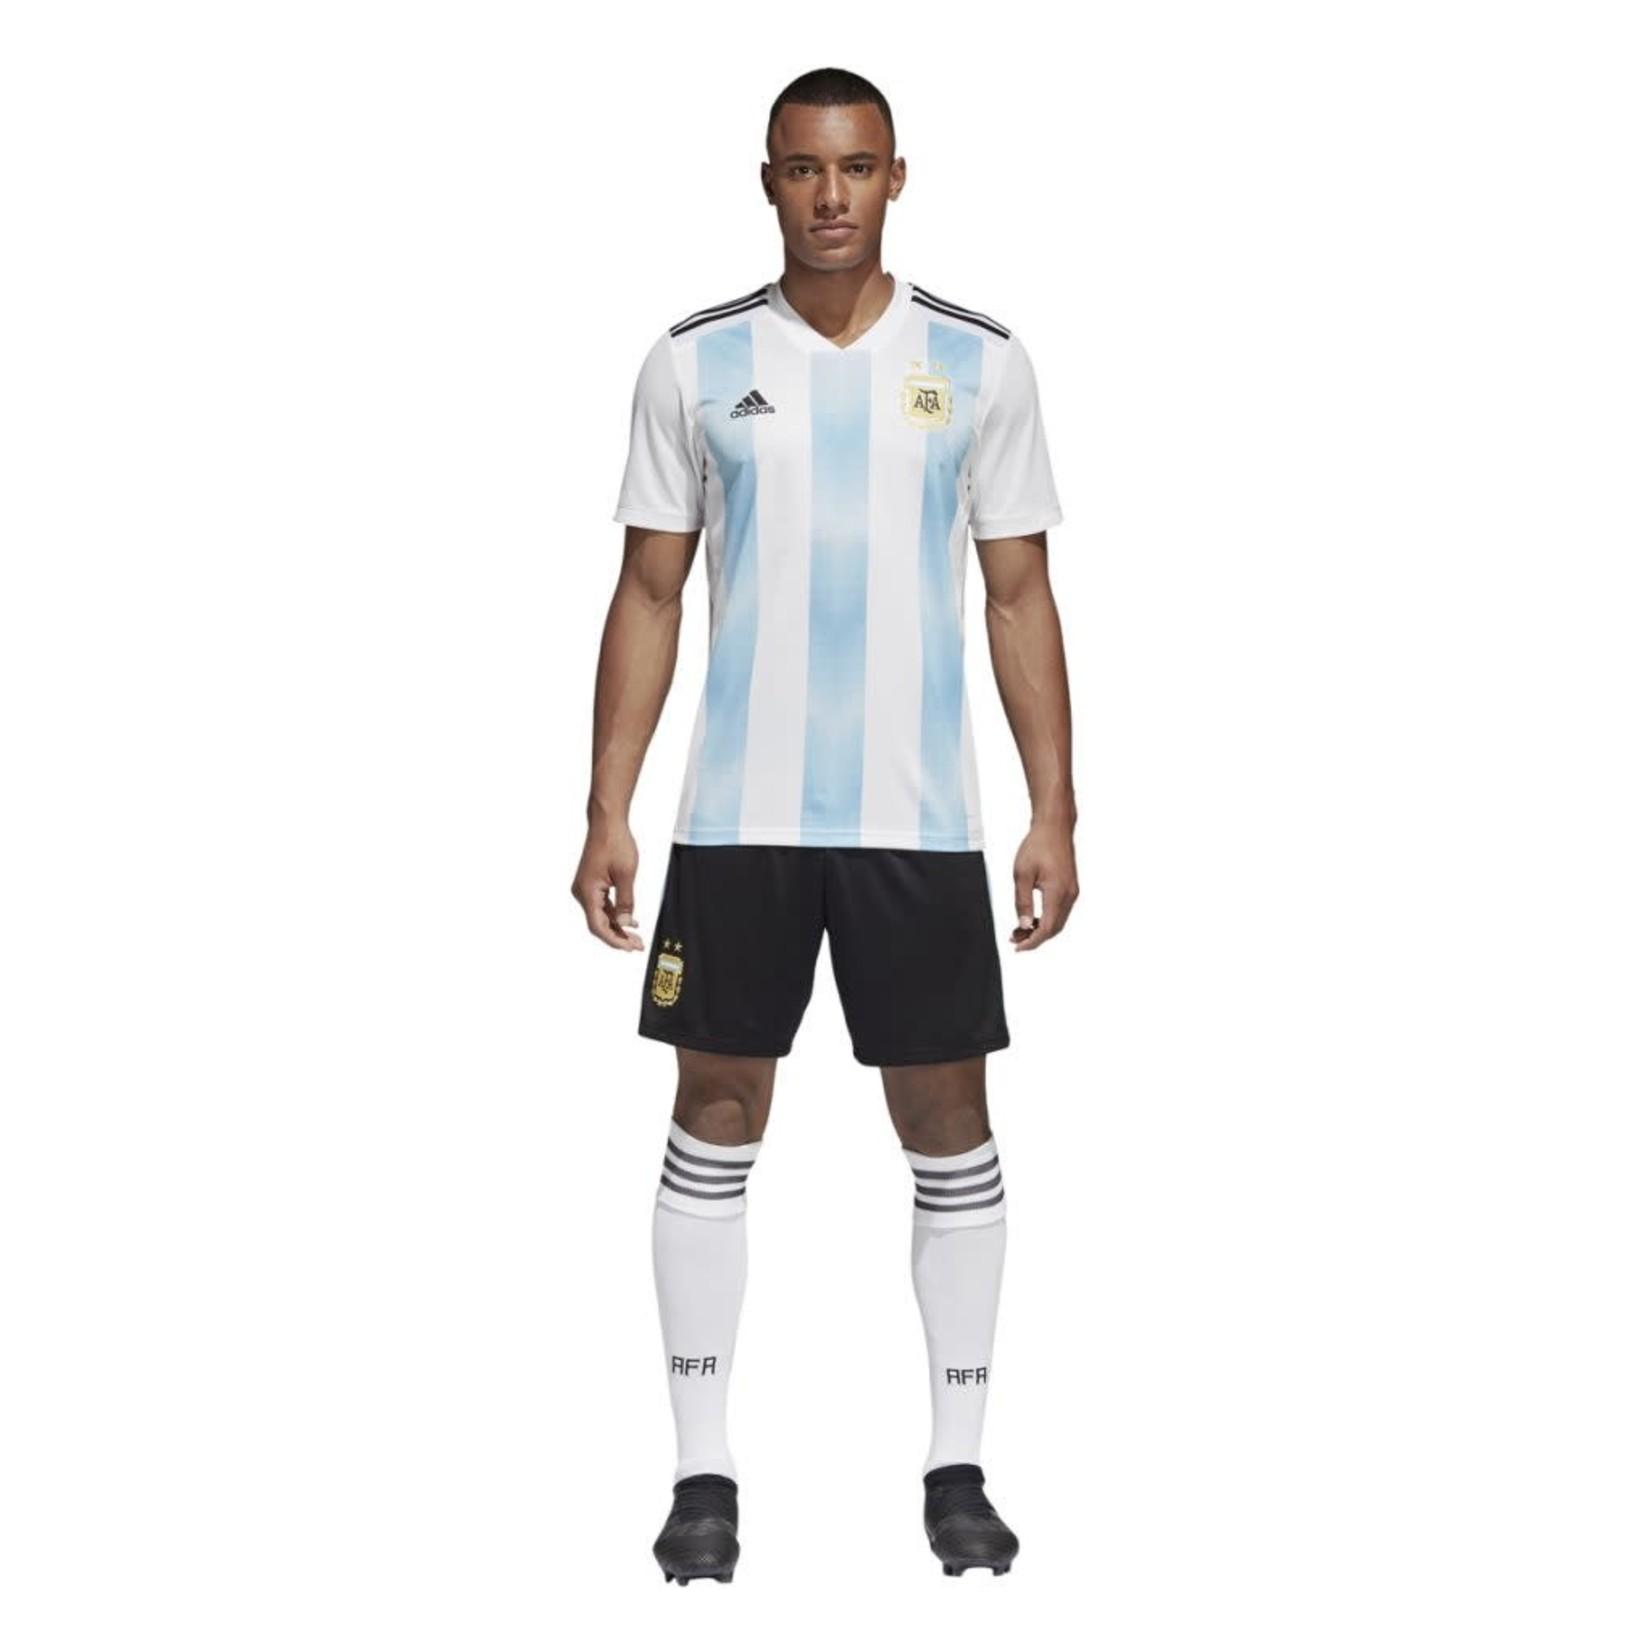 ADIDAS ARGENTINA 2018 HOME JERSEY